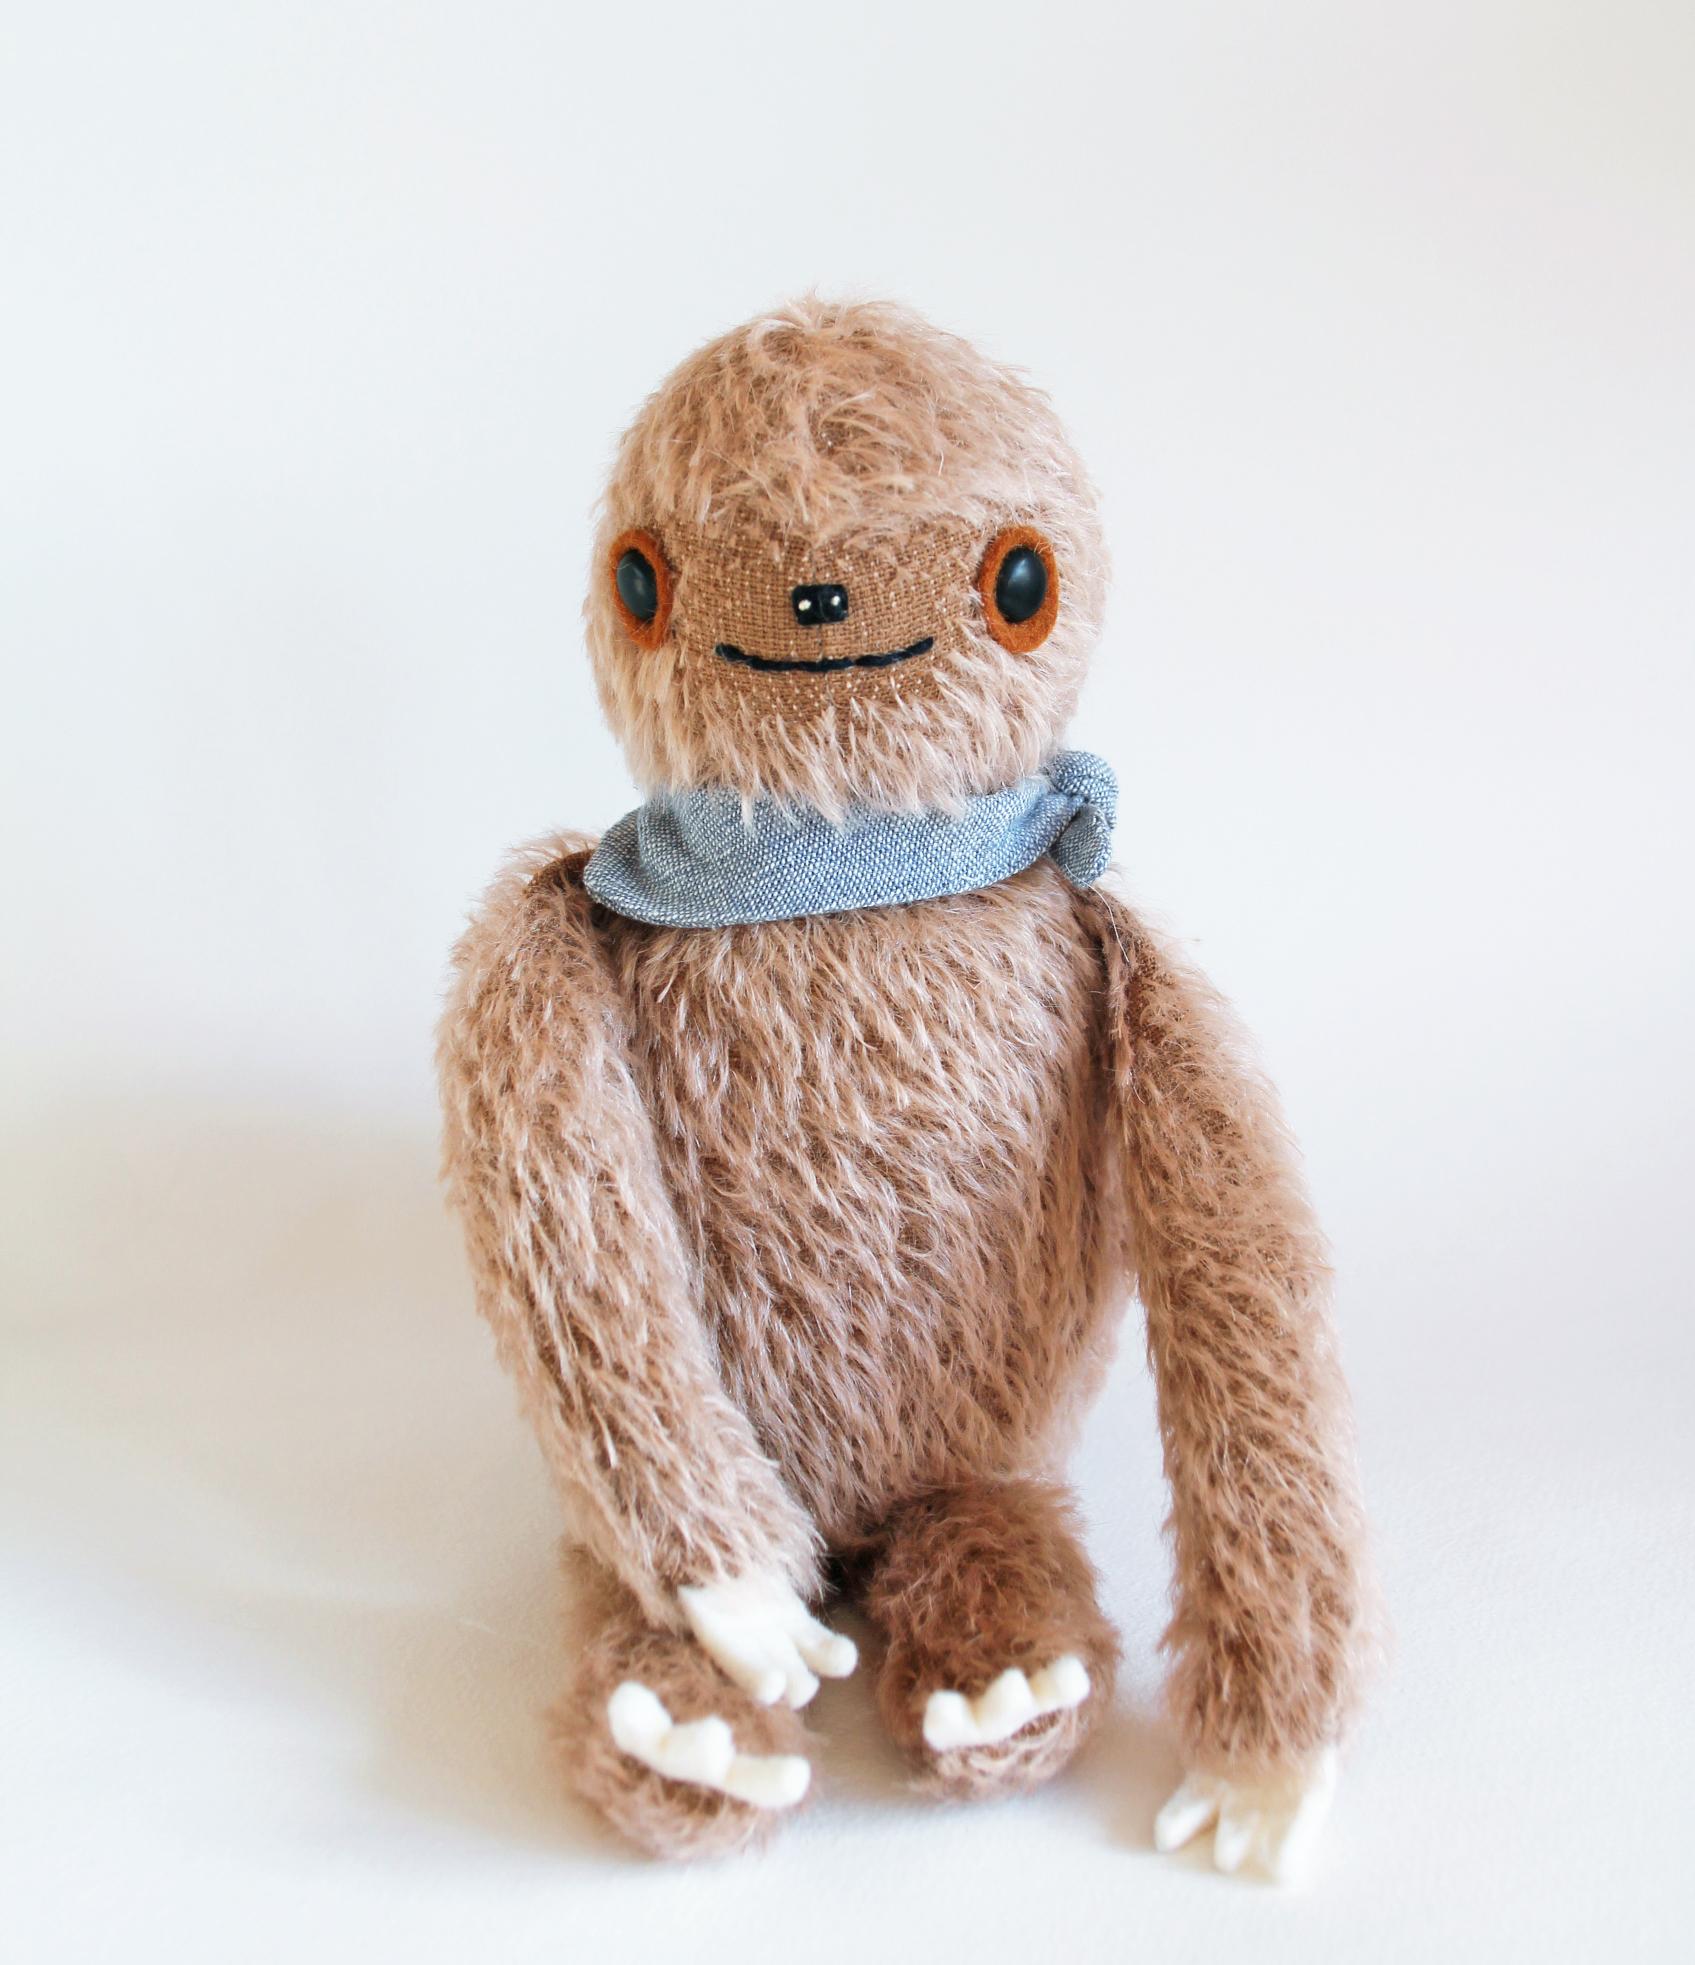 sloth1a.jpg